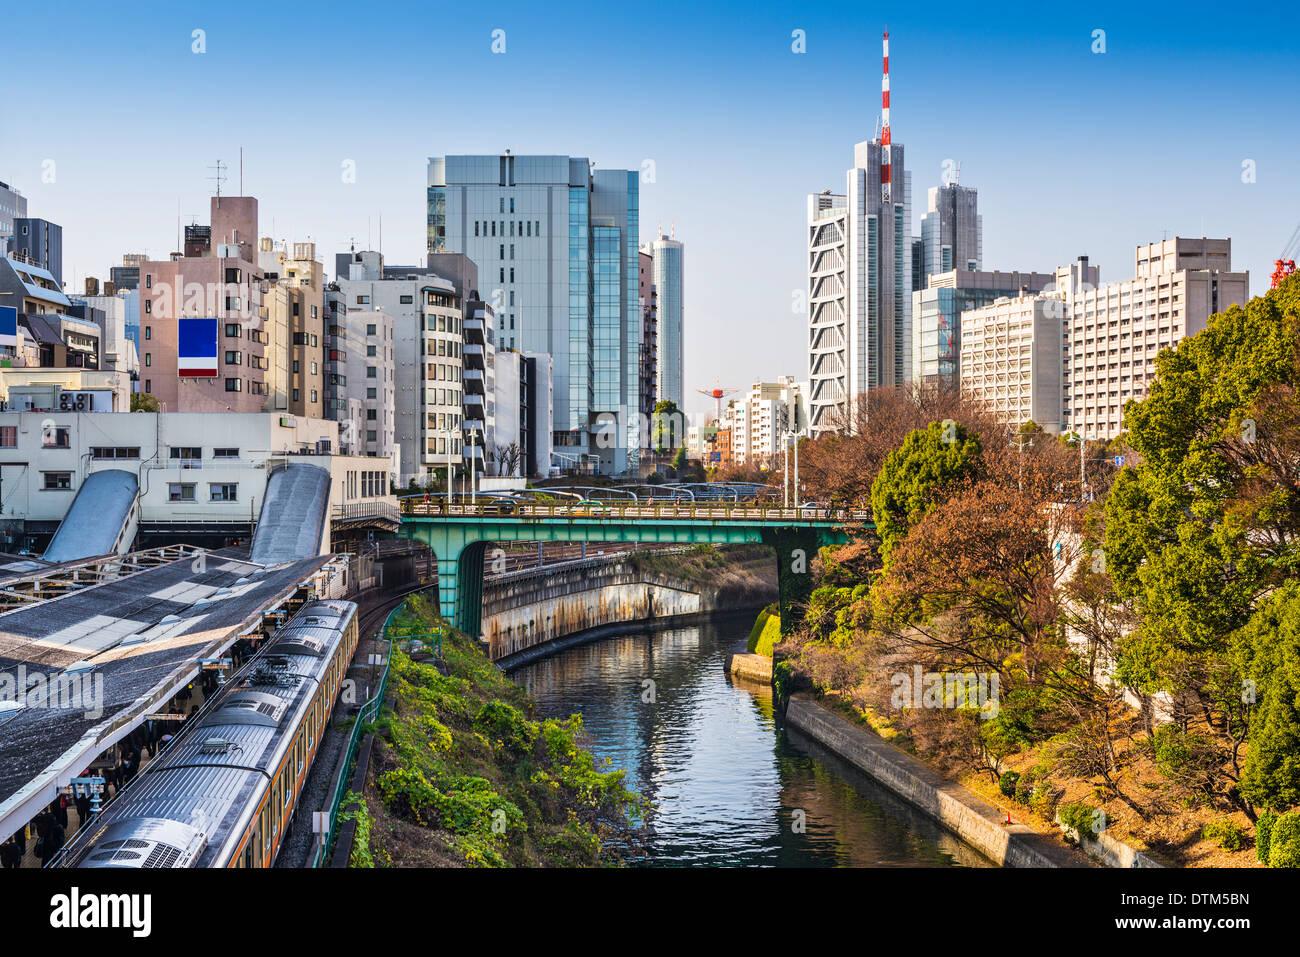 Ochanomizu, Tokyo, Japan at the university buildings. - Stock Image